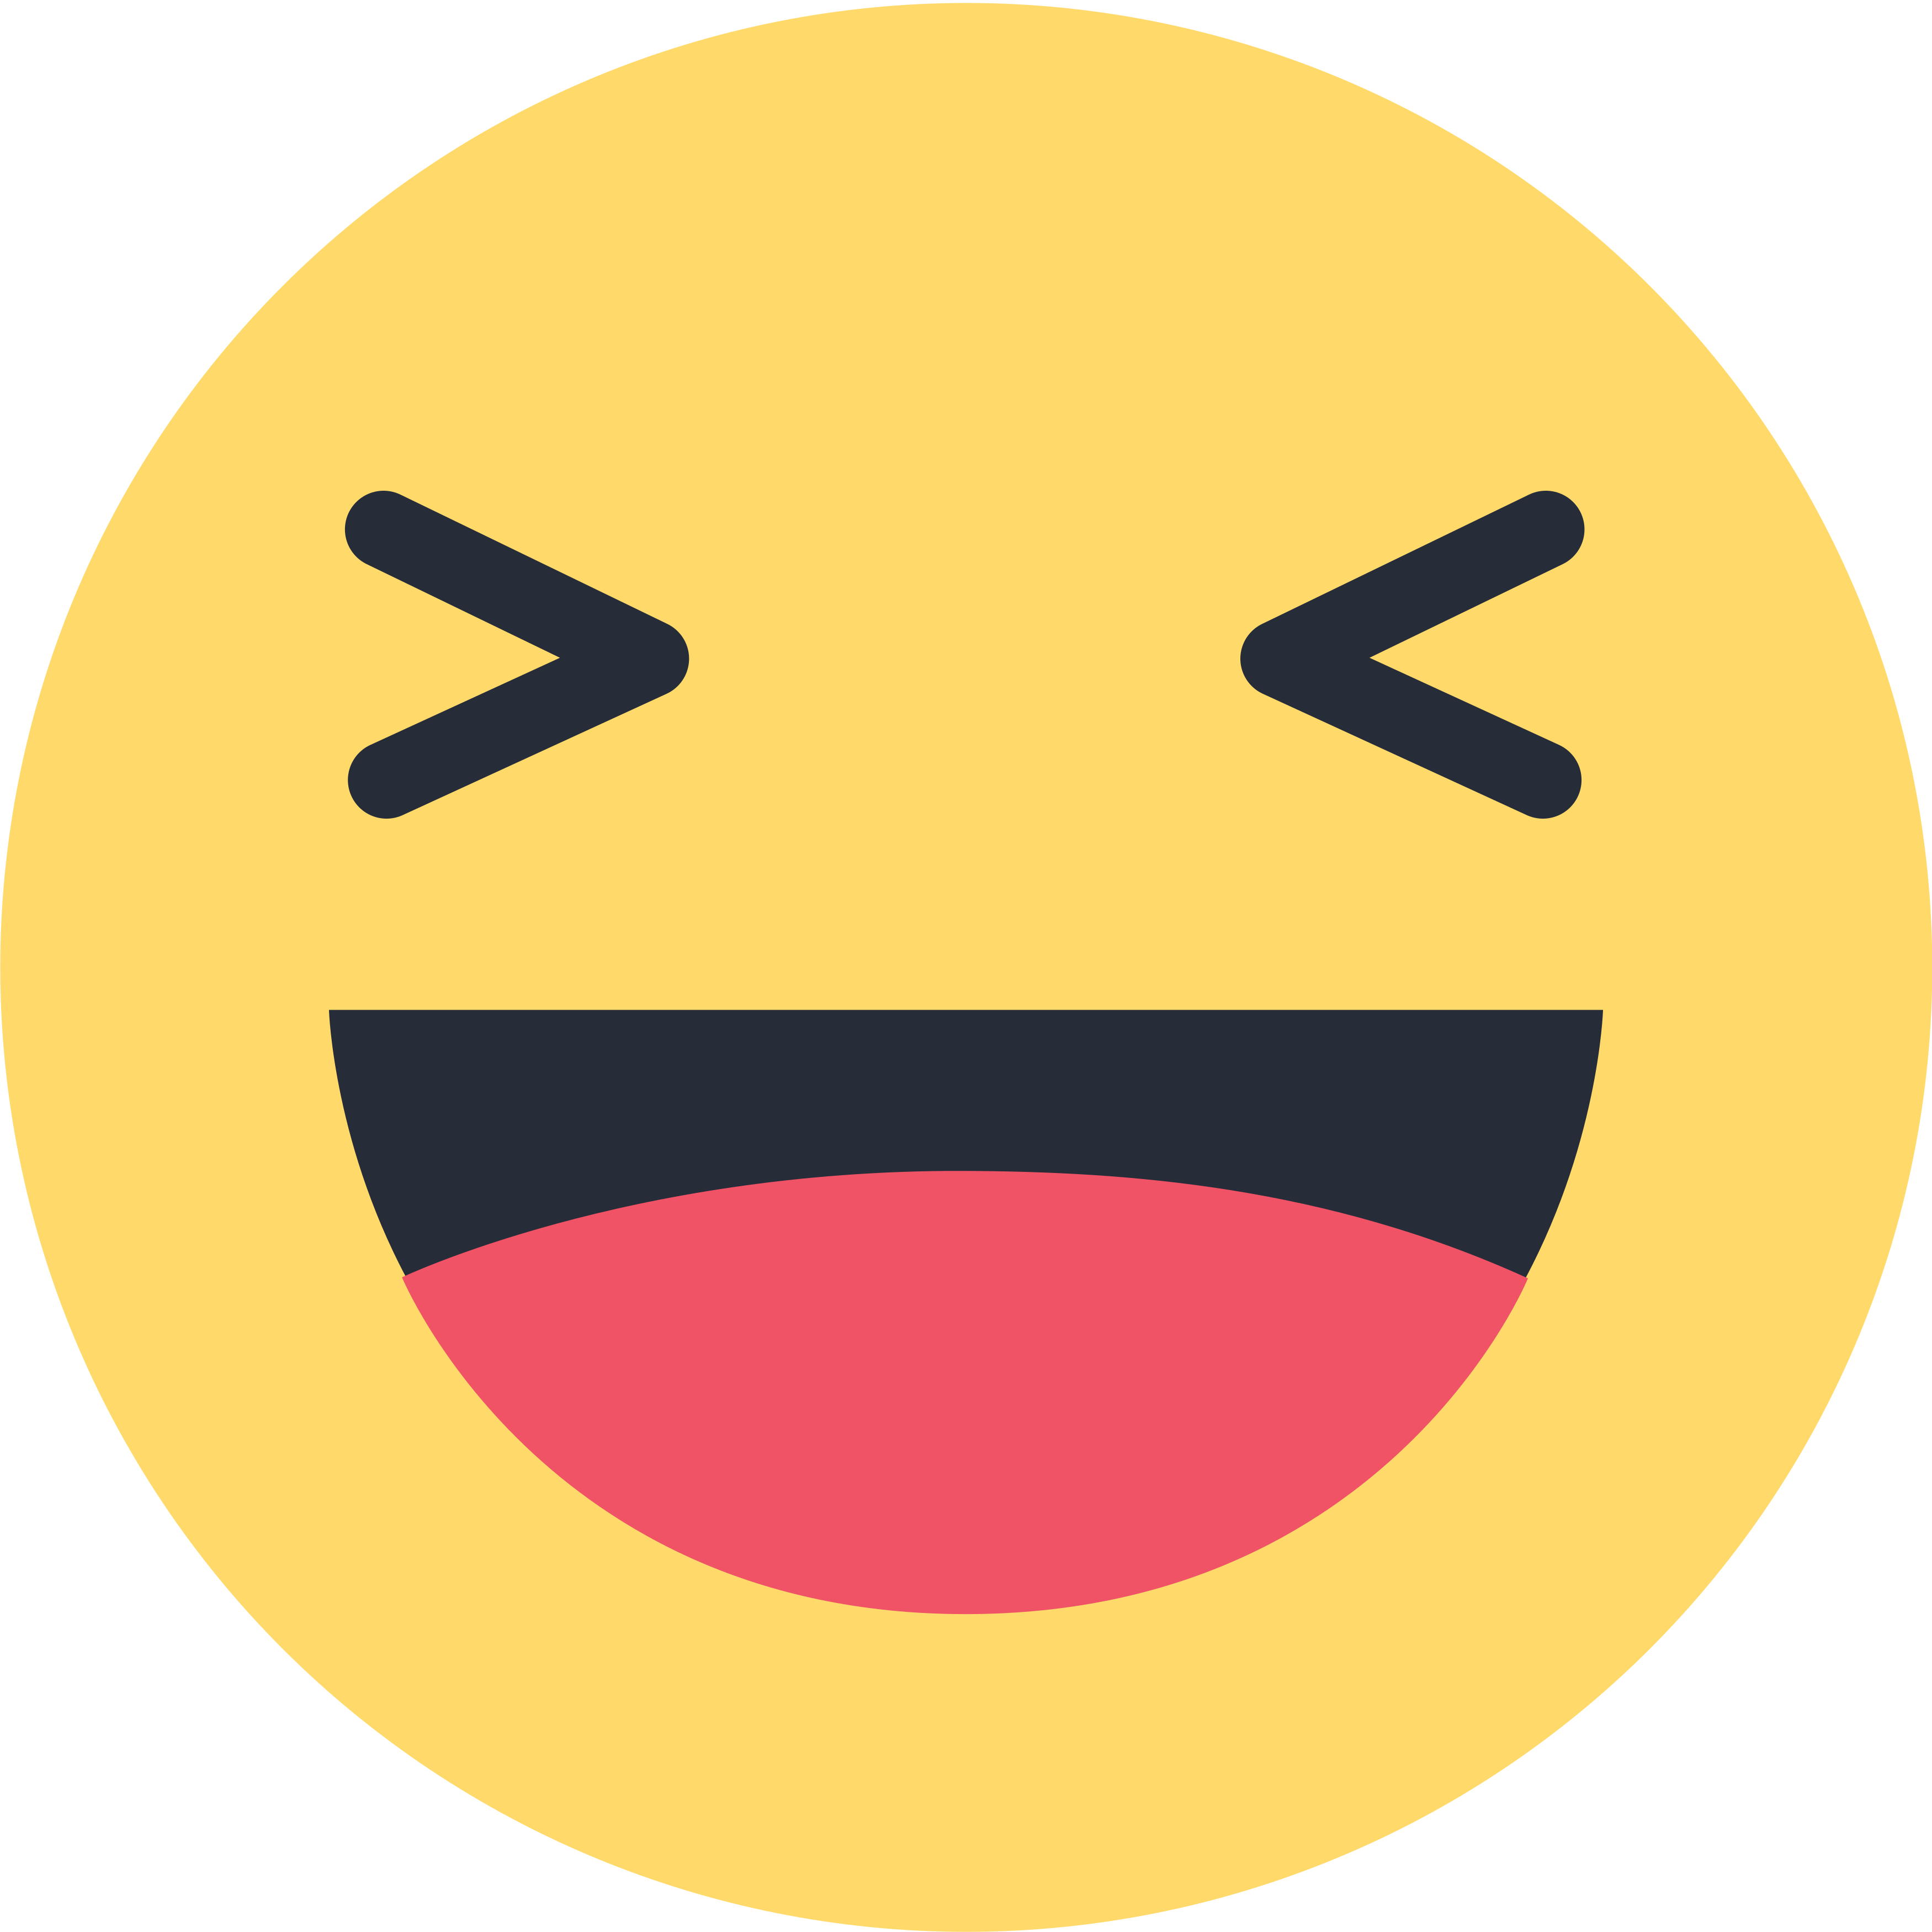 Facebook Emoji Haha (risada).